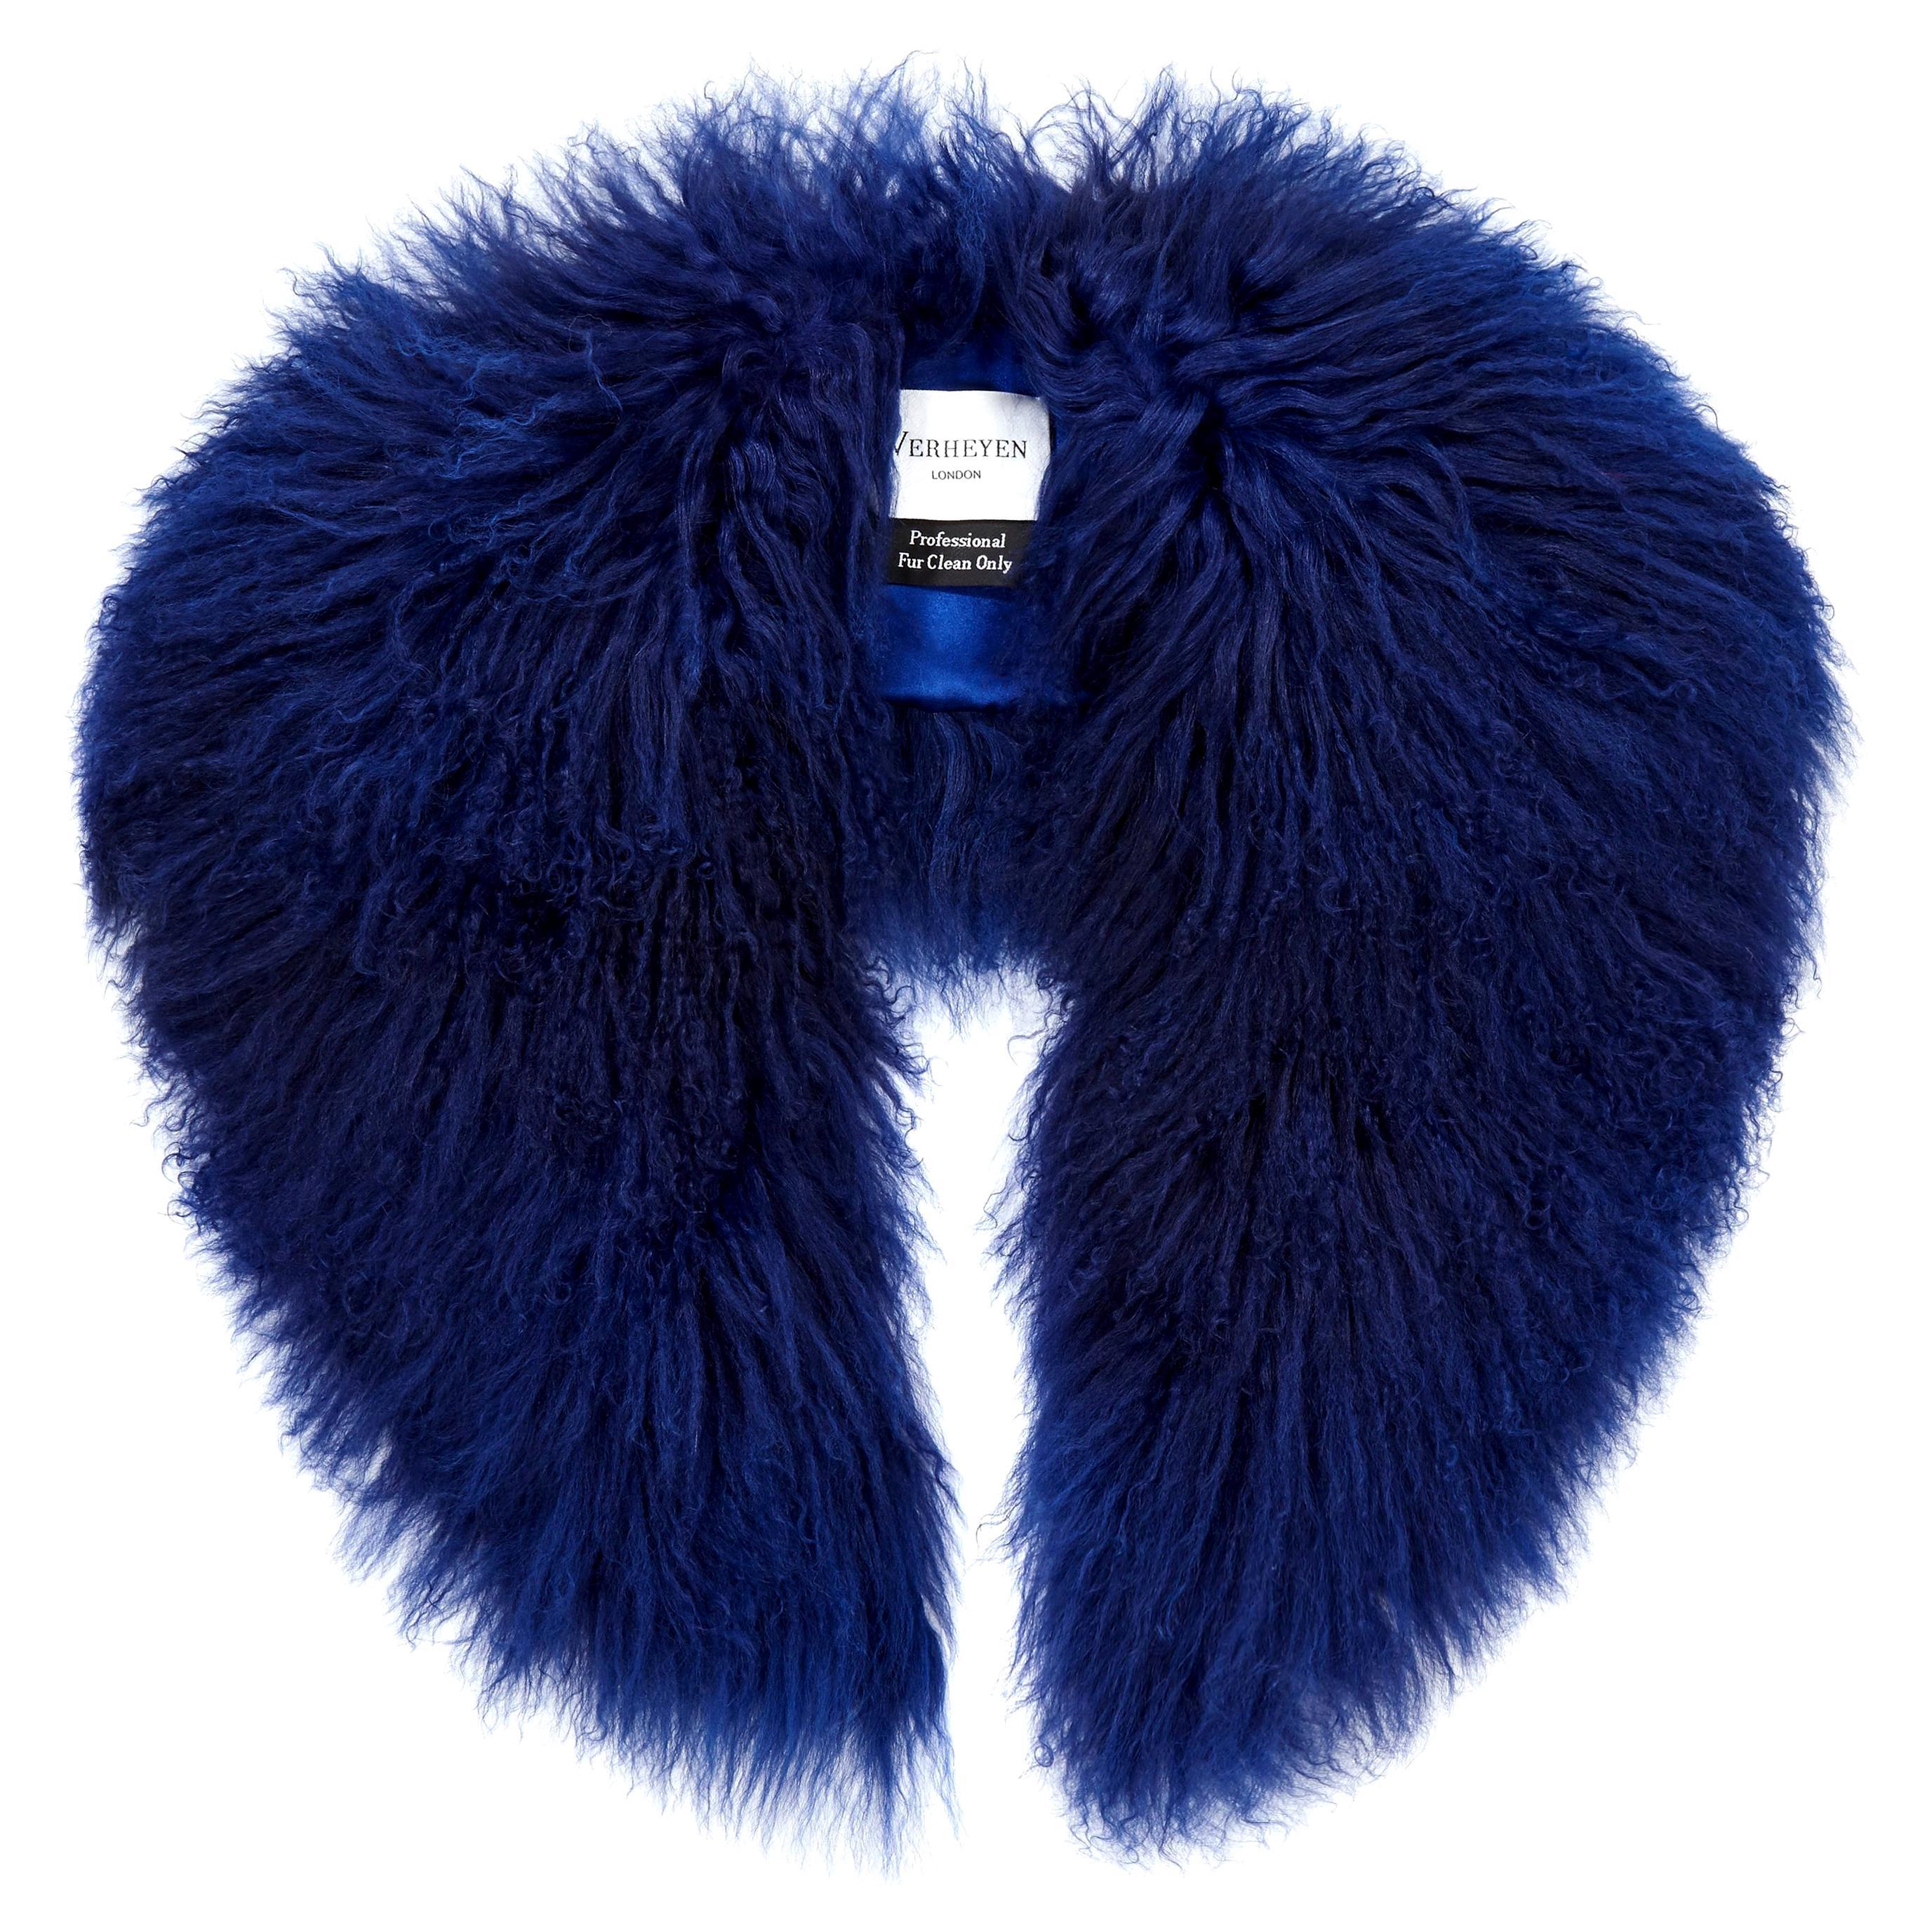 Verheyen London Shawl Collar in Sapphire Mongolian Lamb - Brand New